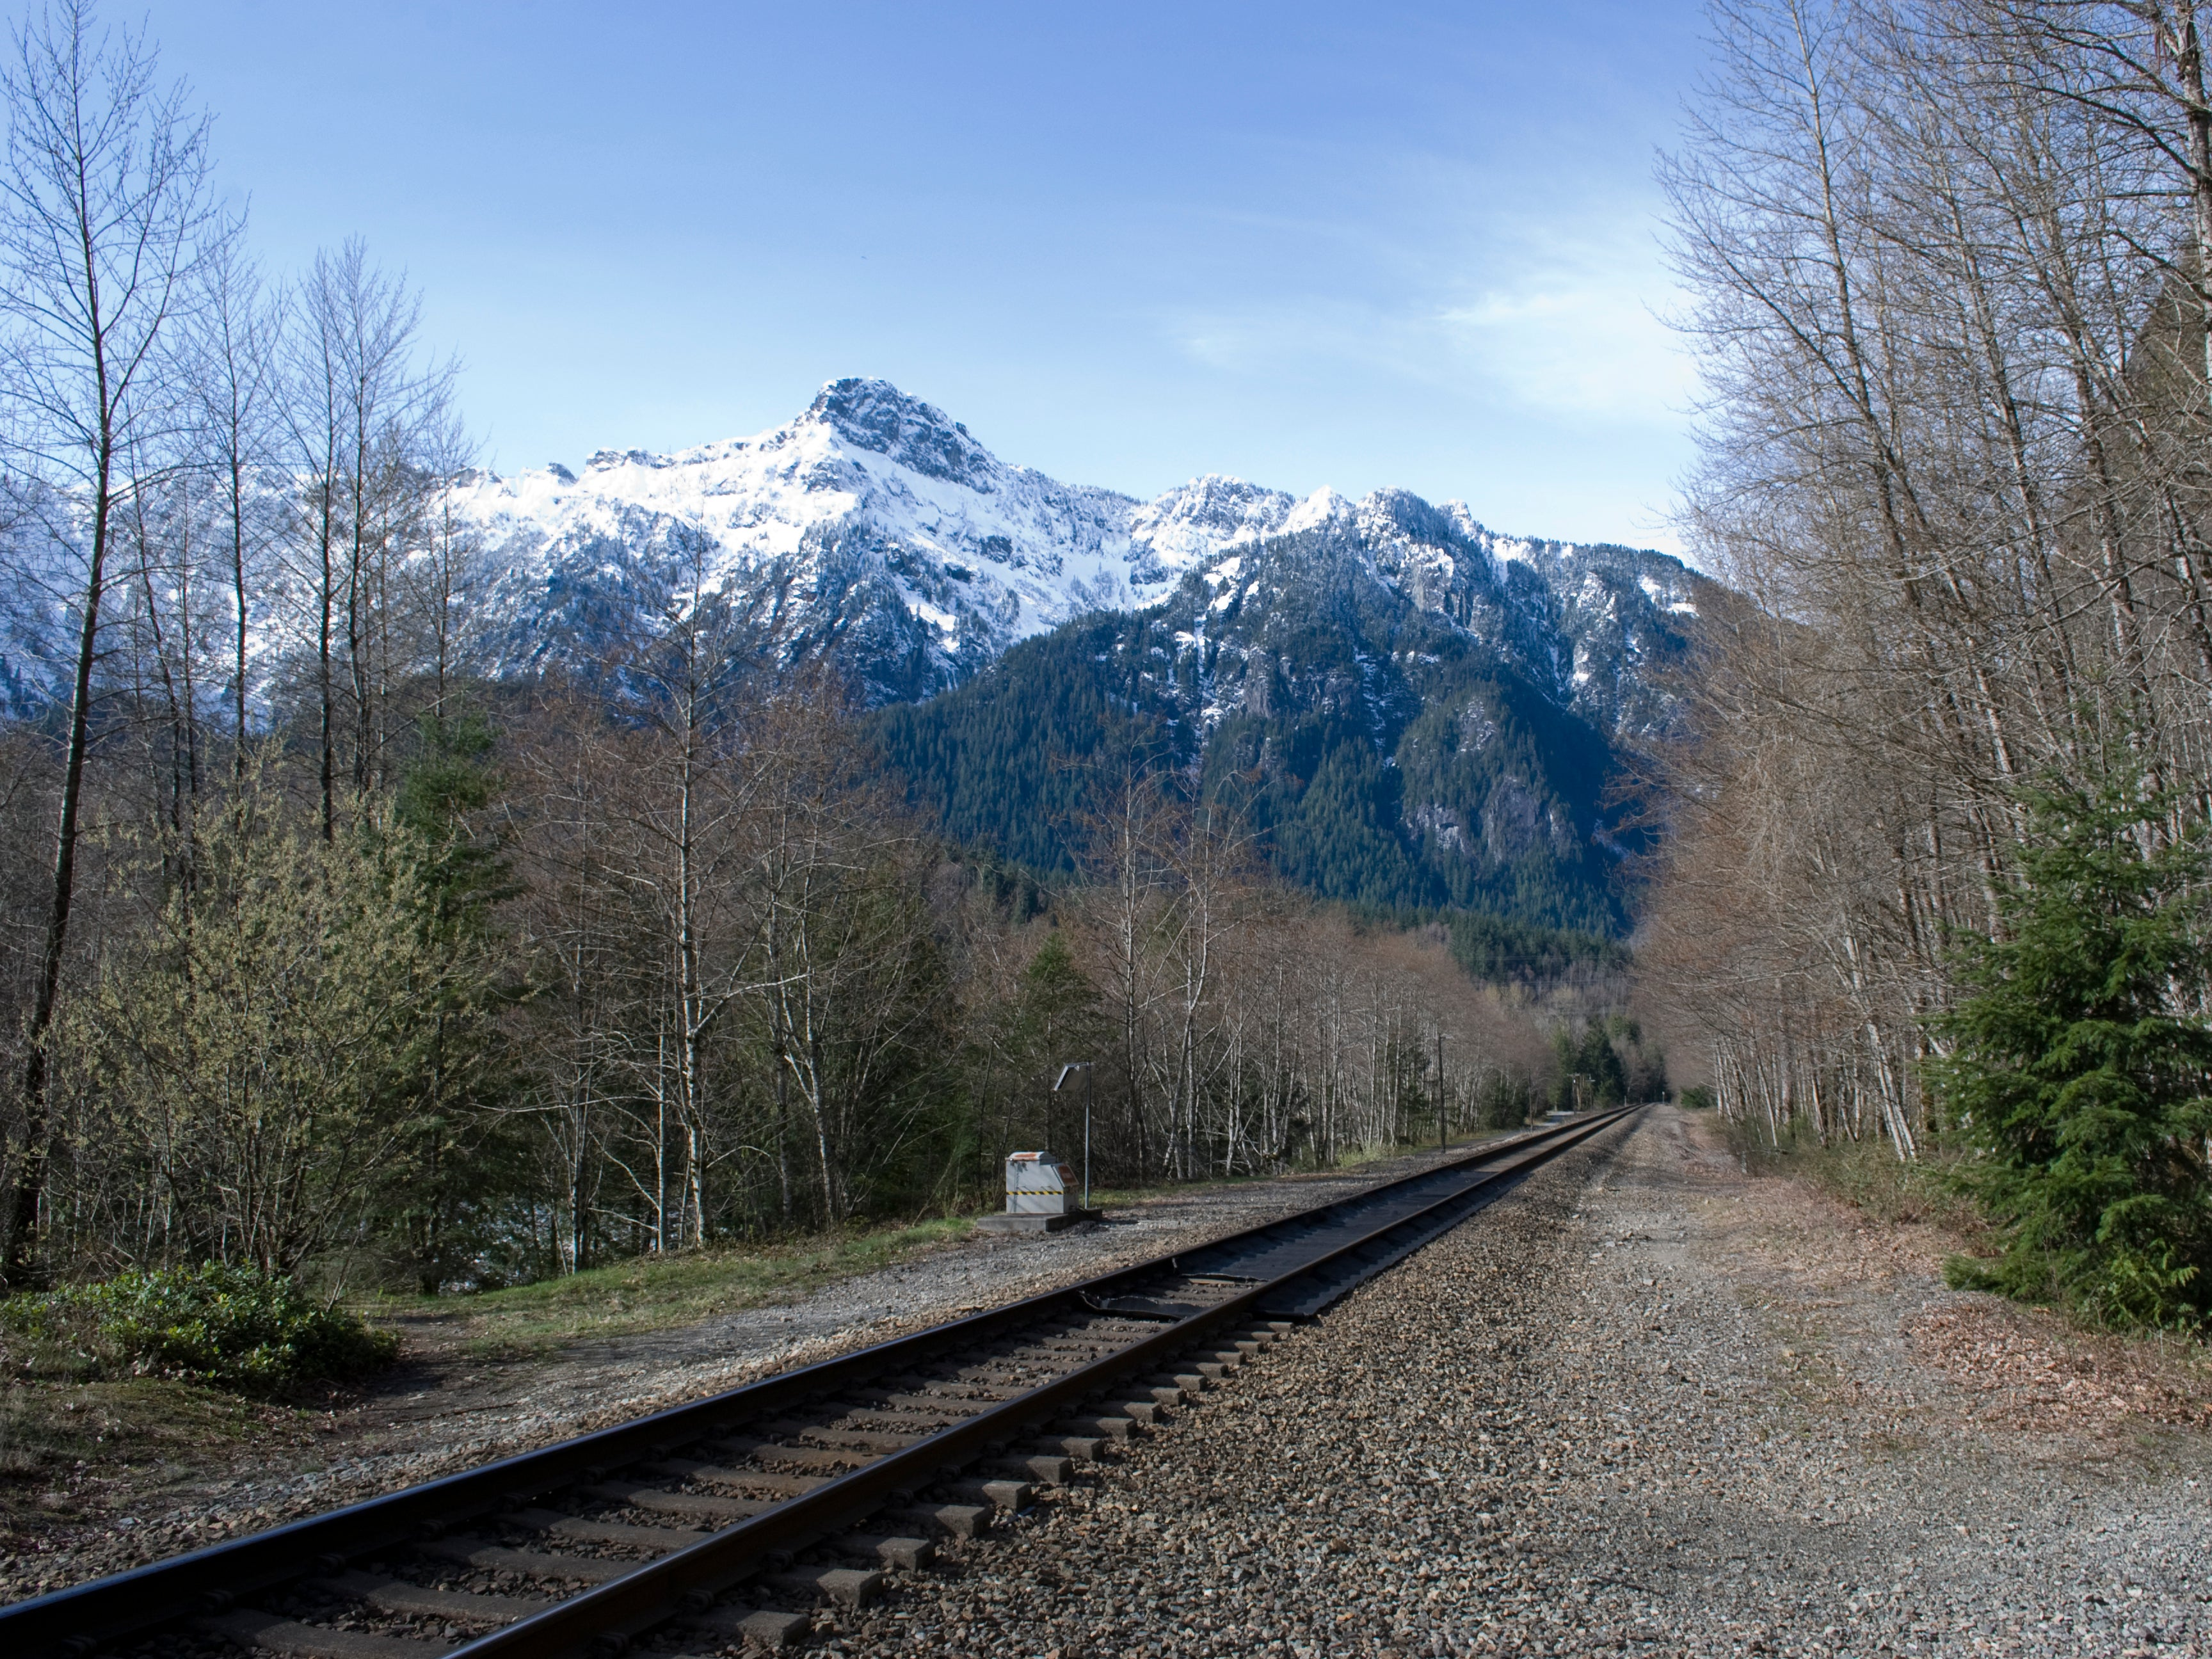 100 days outdoors - week 4 - montana - rock rappel